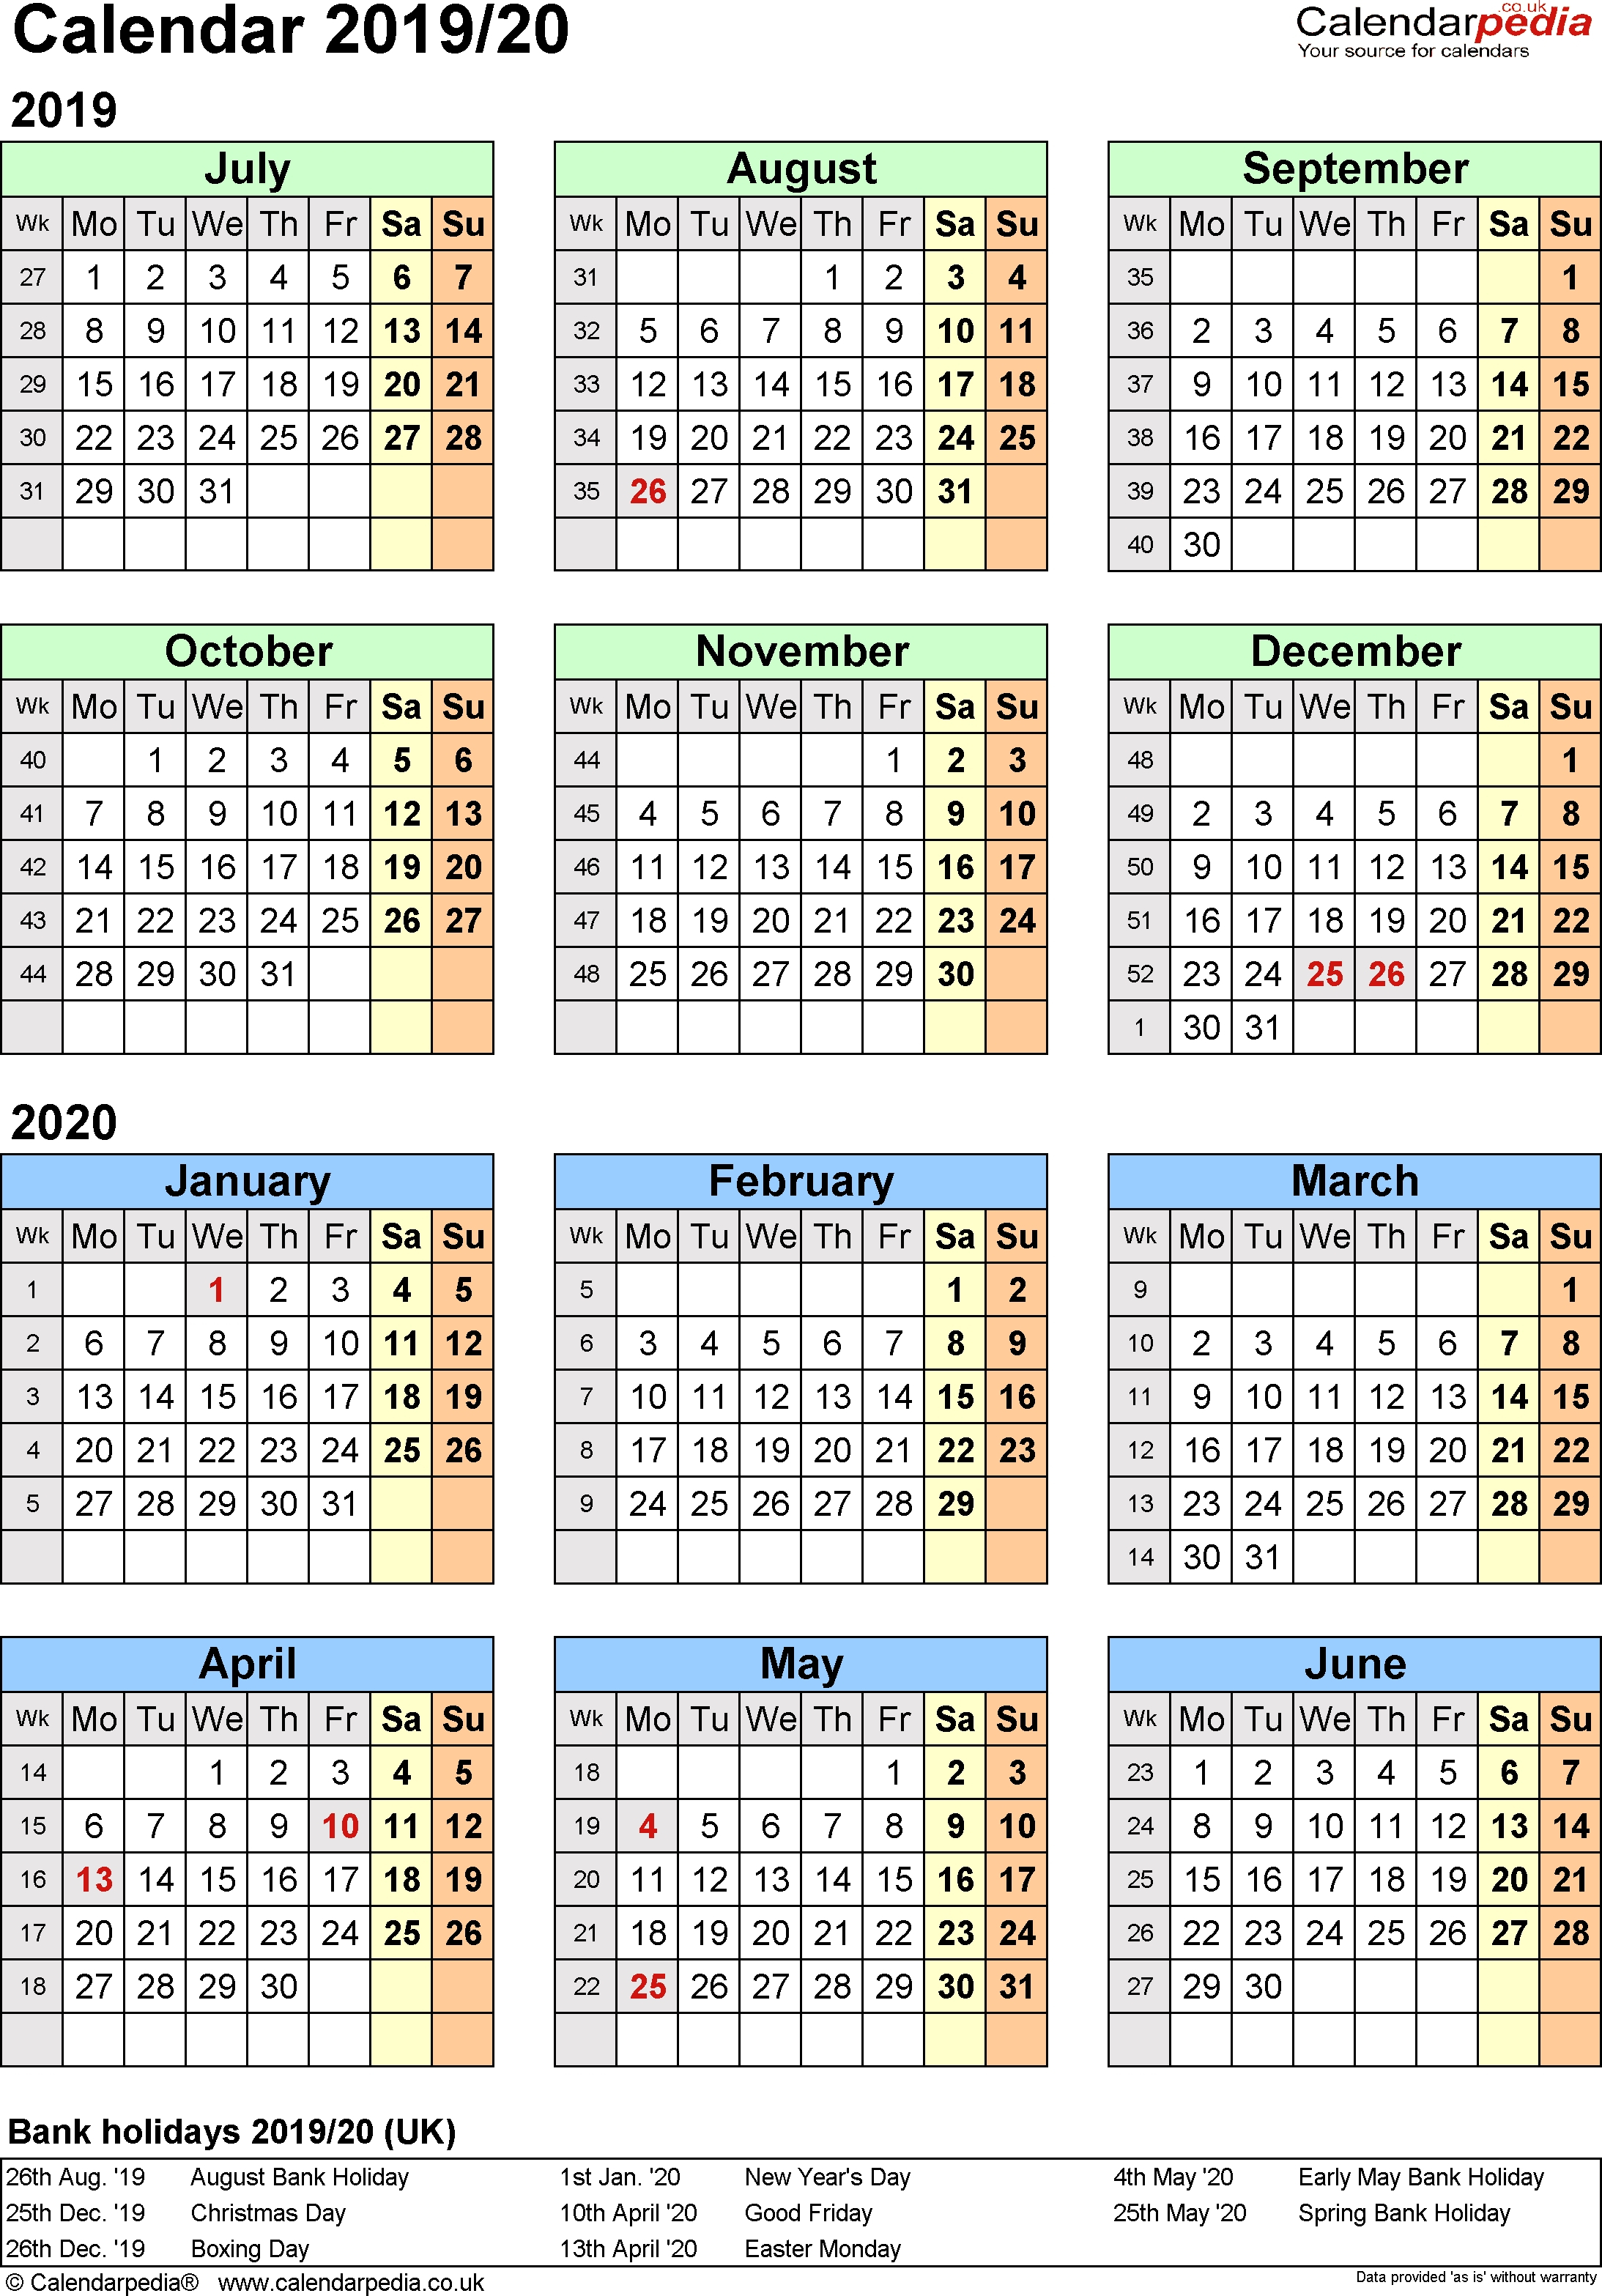 April Calendar Archives » Creative Calendar Ideas with regard to Split Calendar 2019 2020 South Australia